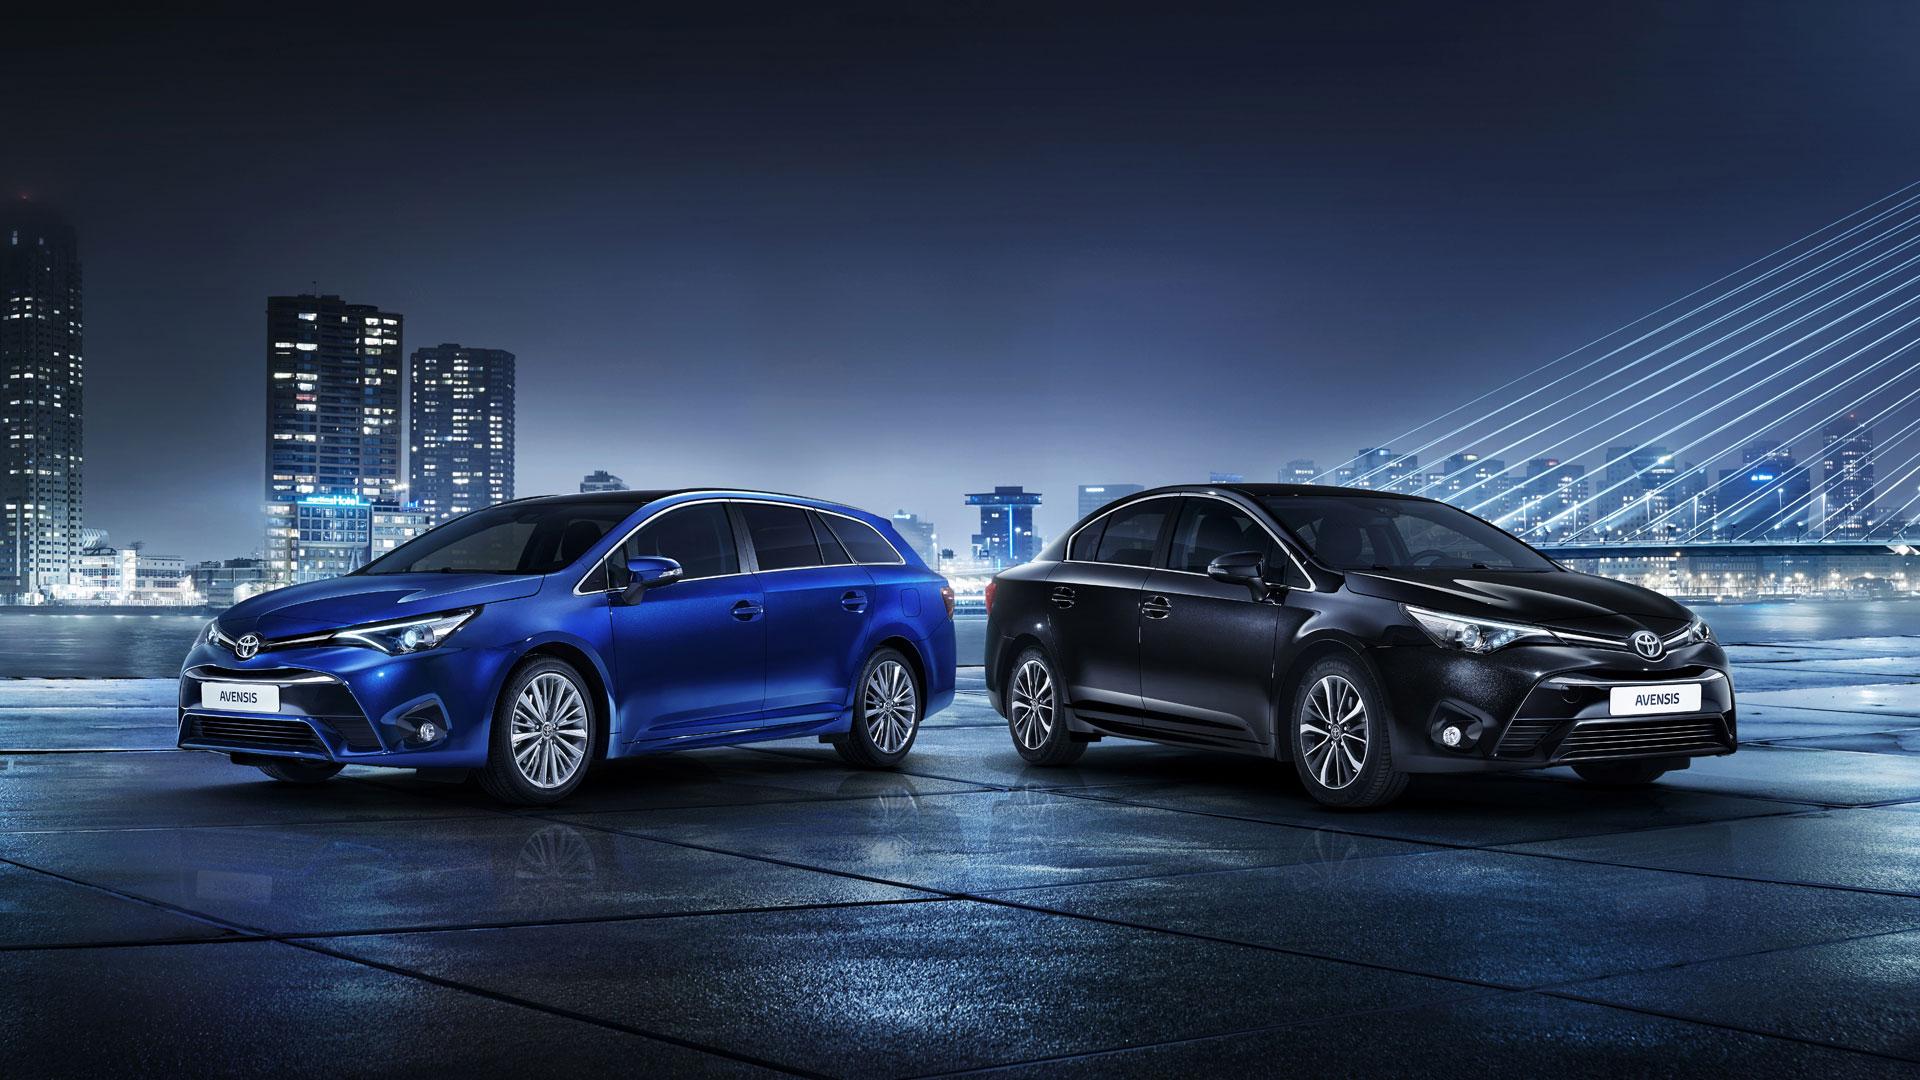 Toyota Avensis - nowa generacja - sedan i kombi